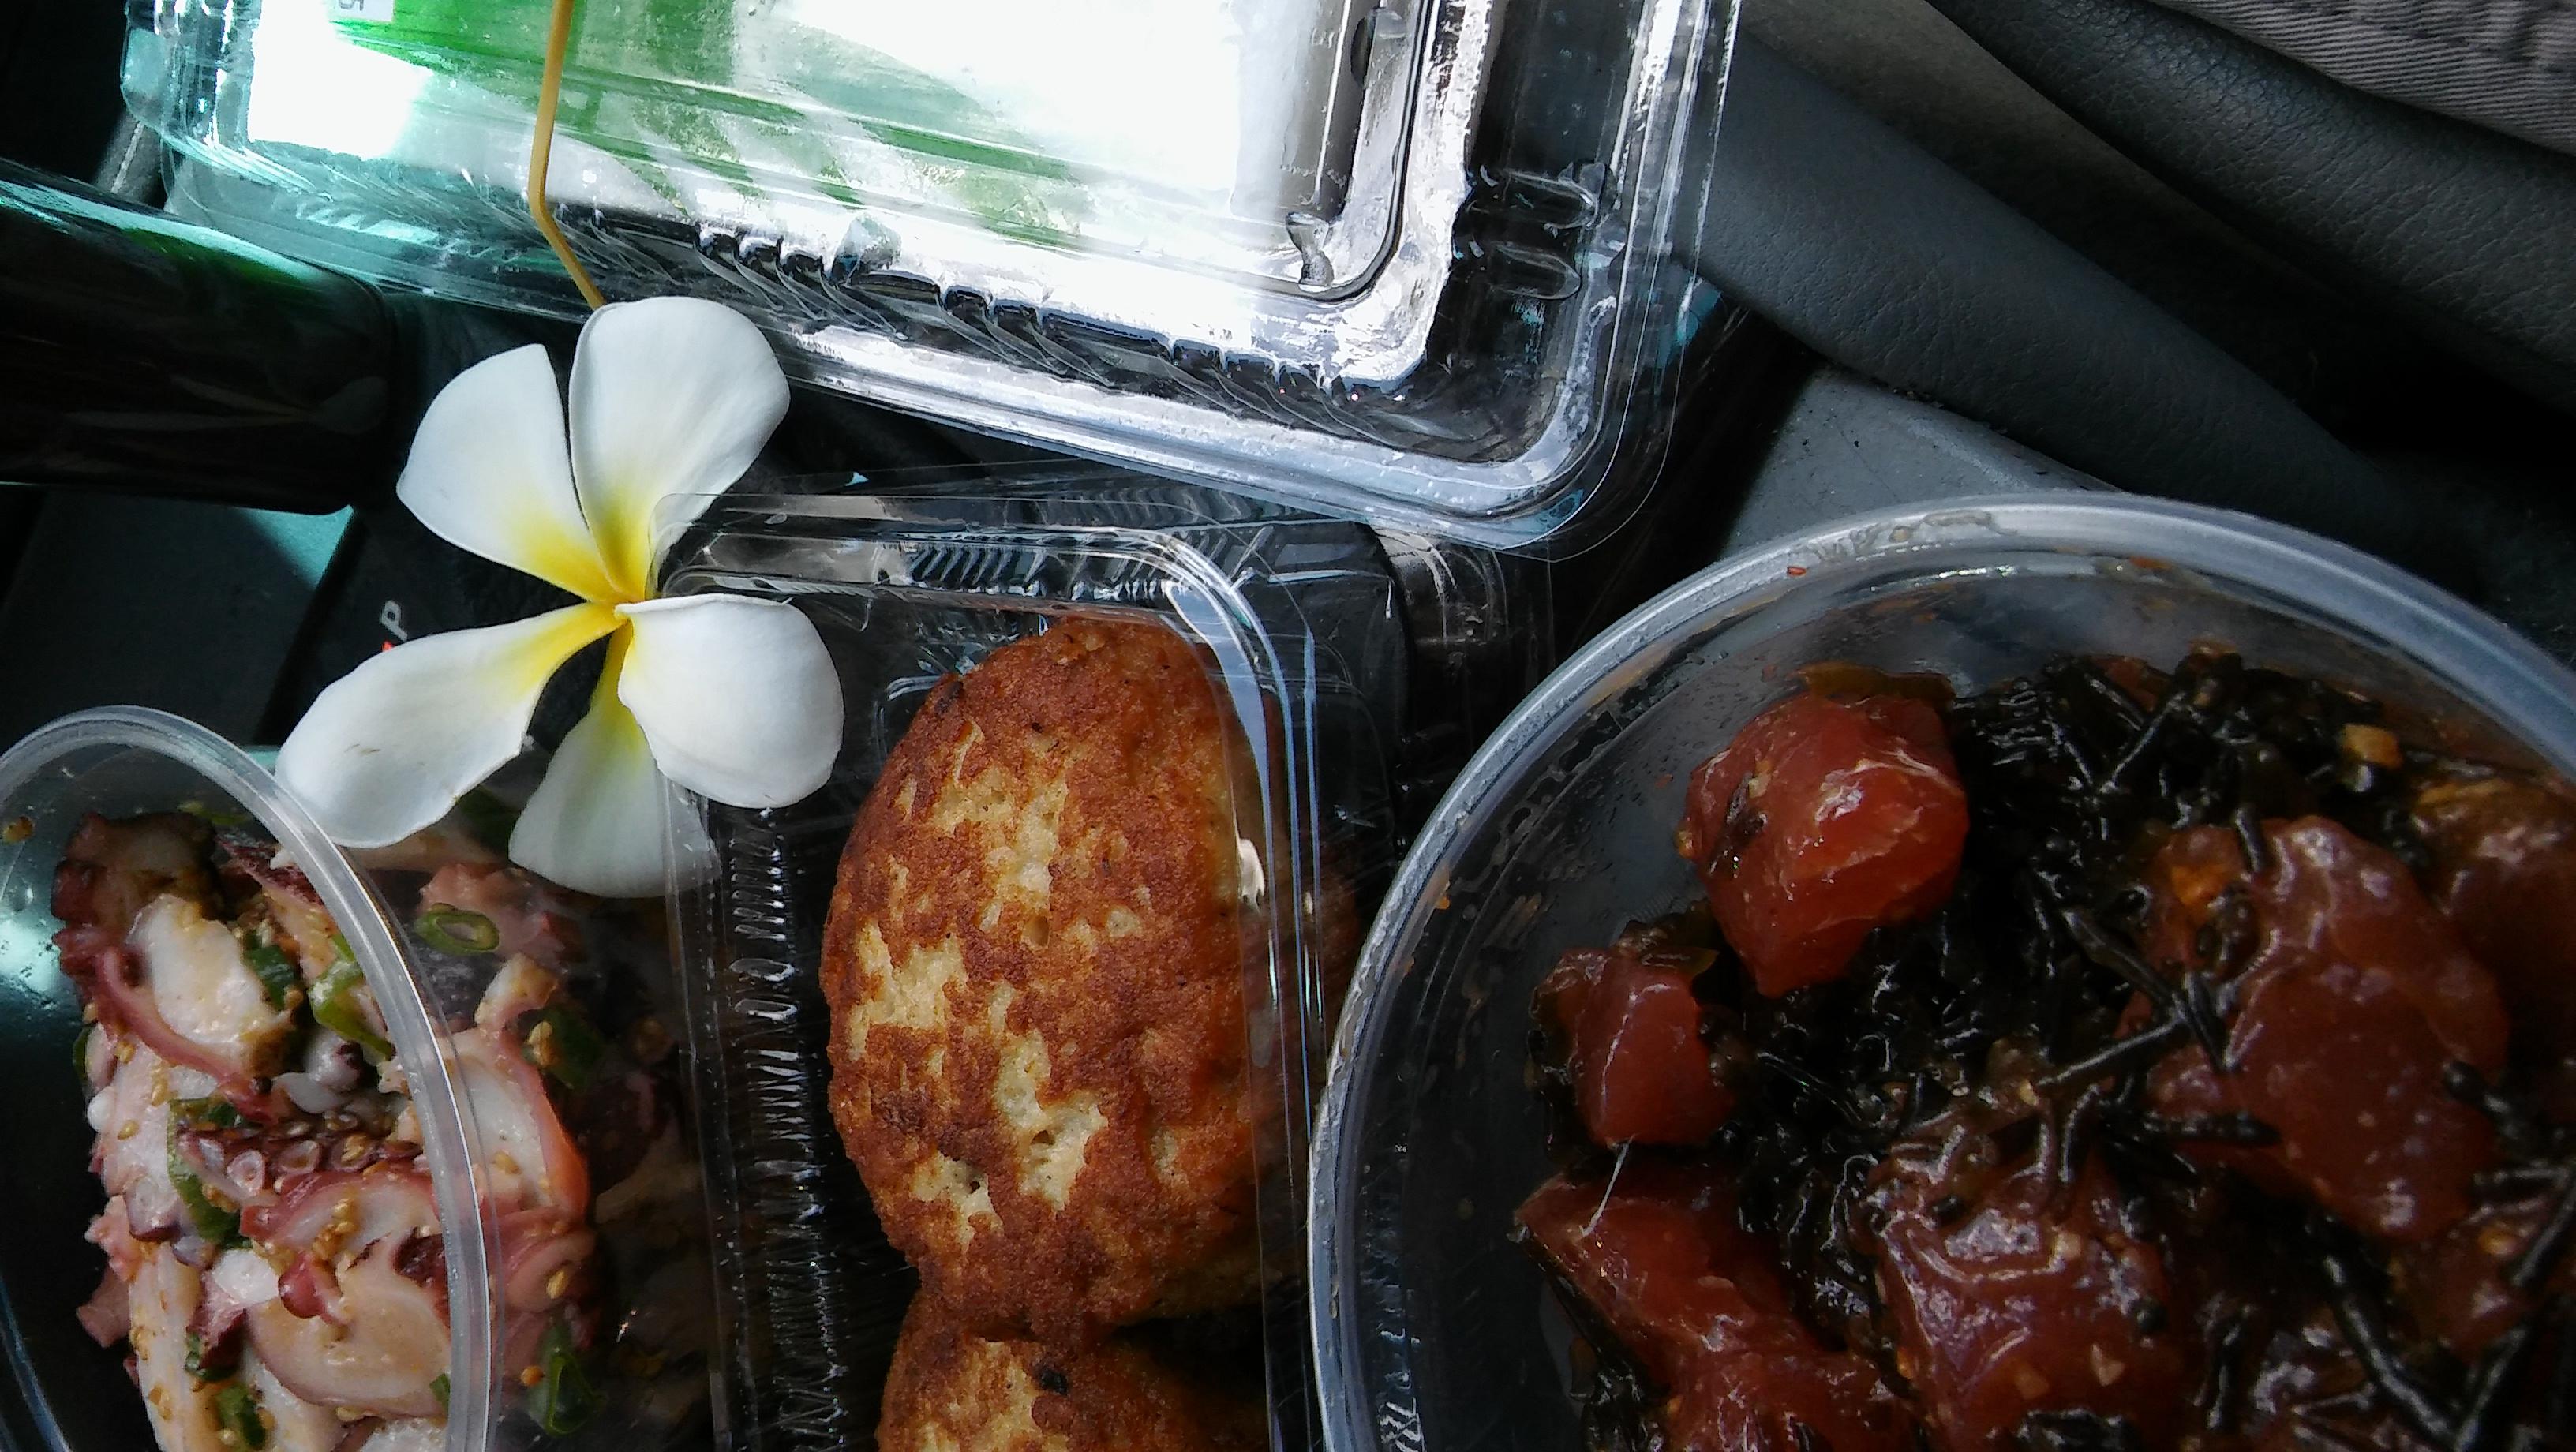 Tanioka's Seafoods & Catering